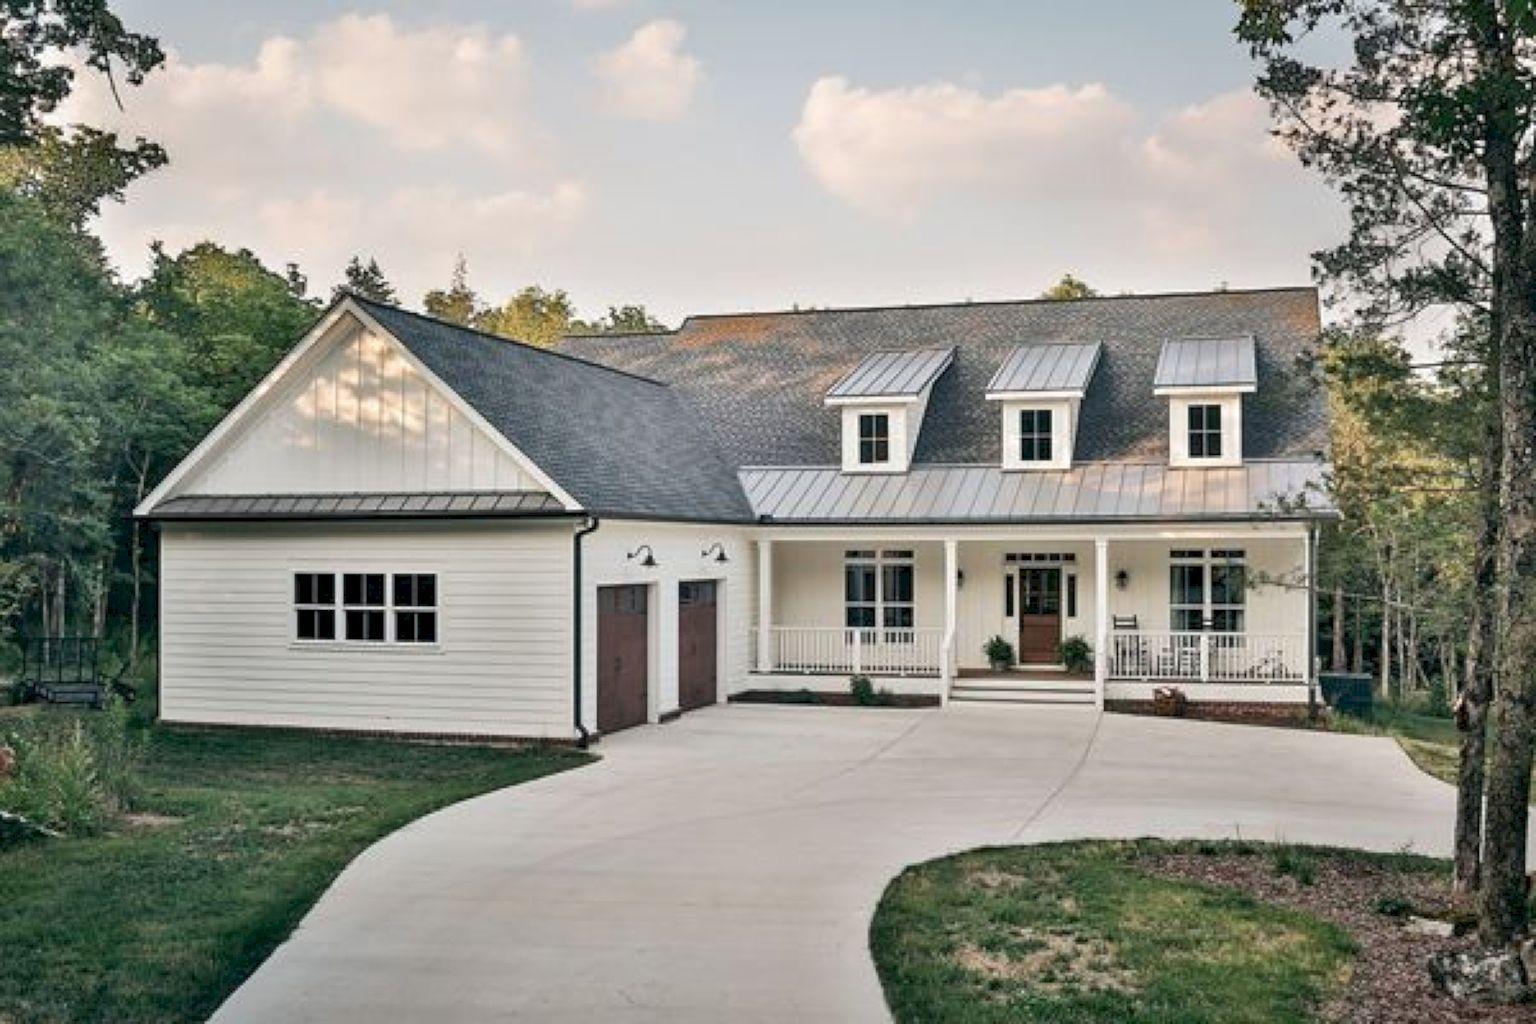 90 beautiful modern farmhouse exterior ideas beautiful on beautiful modern farmhouse trending exterior design ideas id=17501